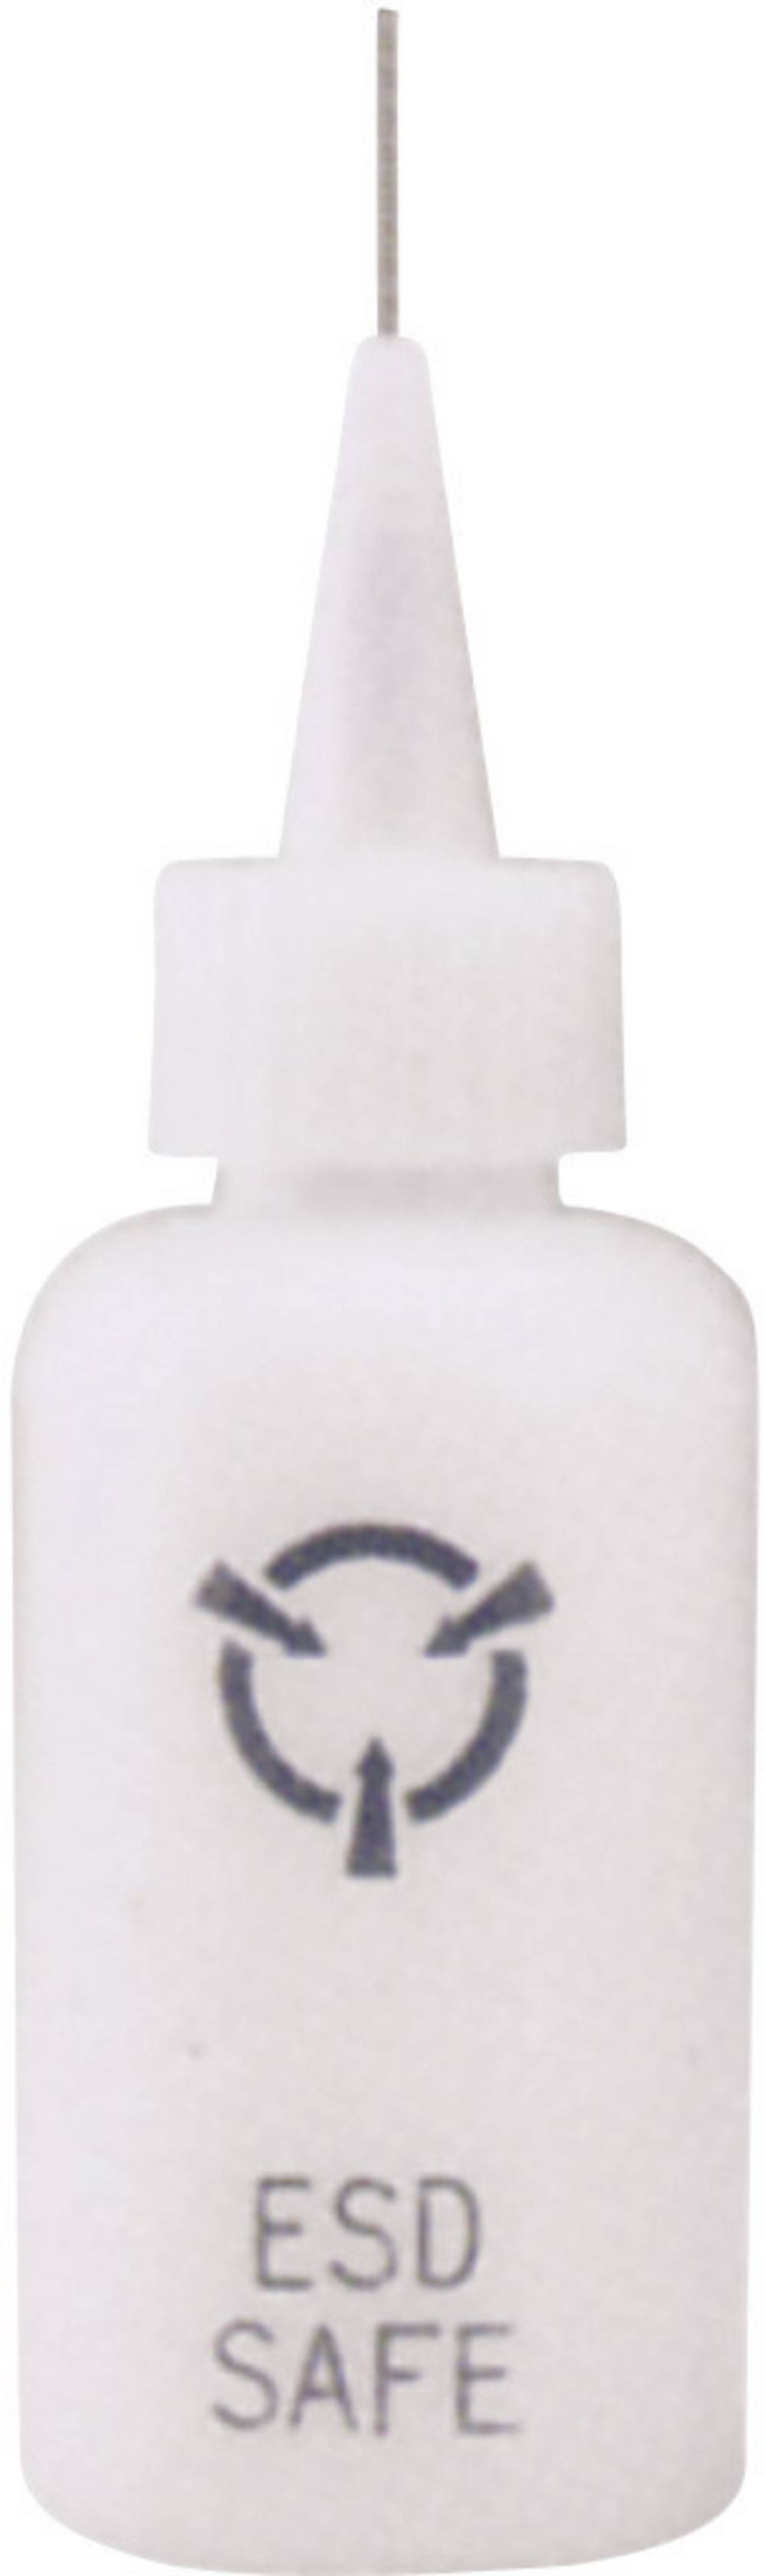 ESD plastenka za tekočine 59 ml BJZ R-FD2-ESD